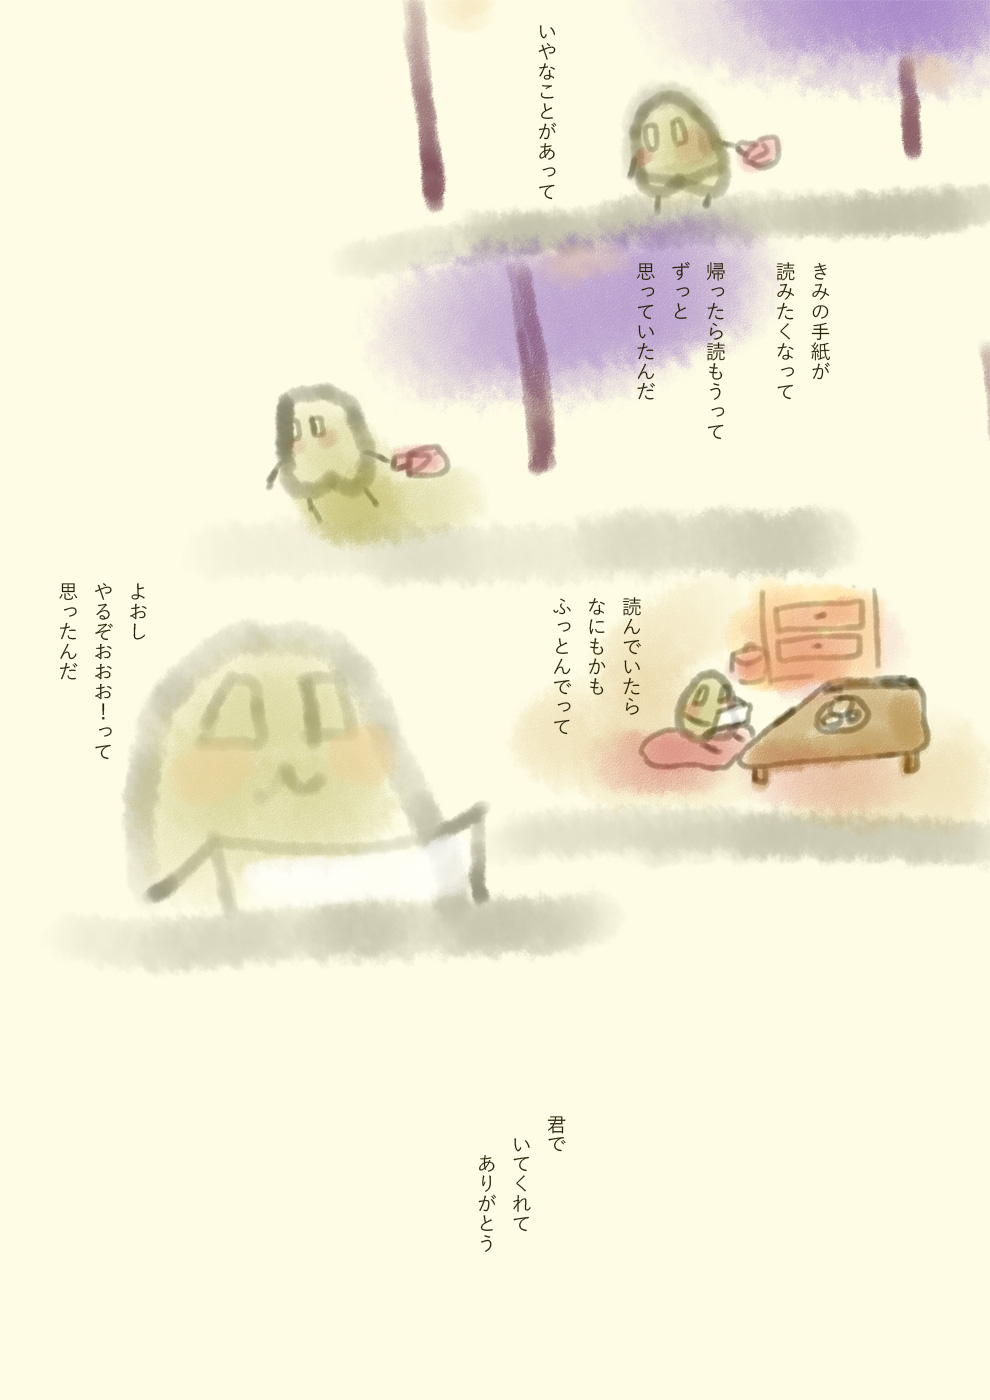 http://ahito.com/comic/short/nega/img/2018/20180321/01.jpg